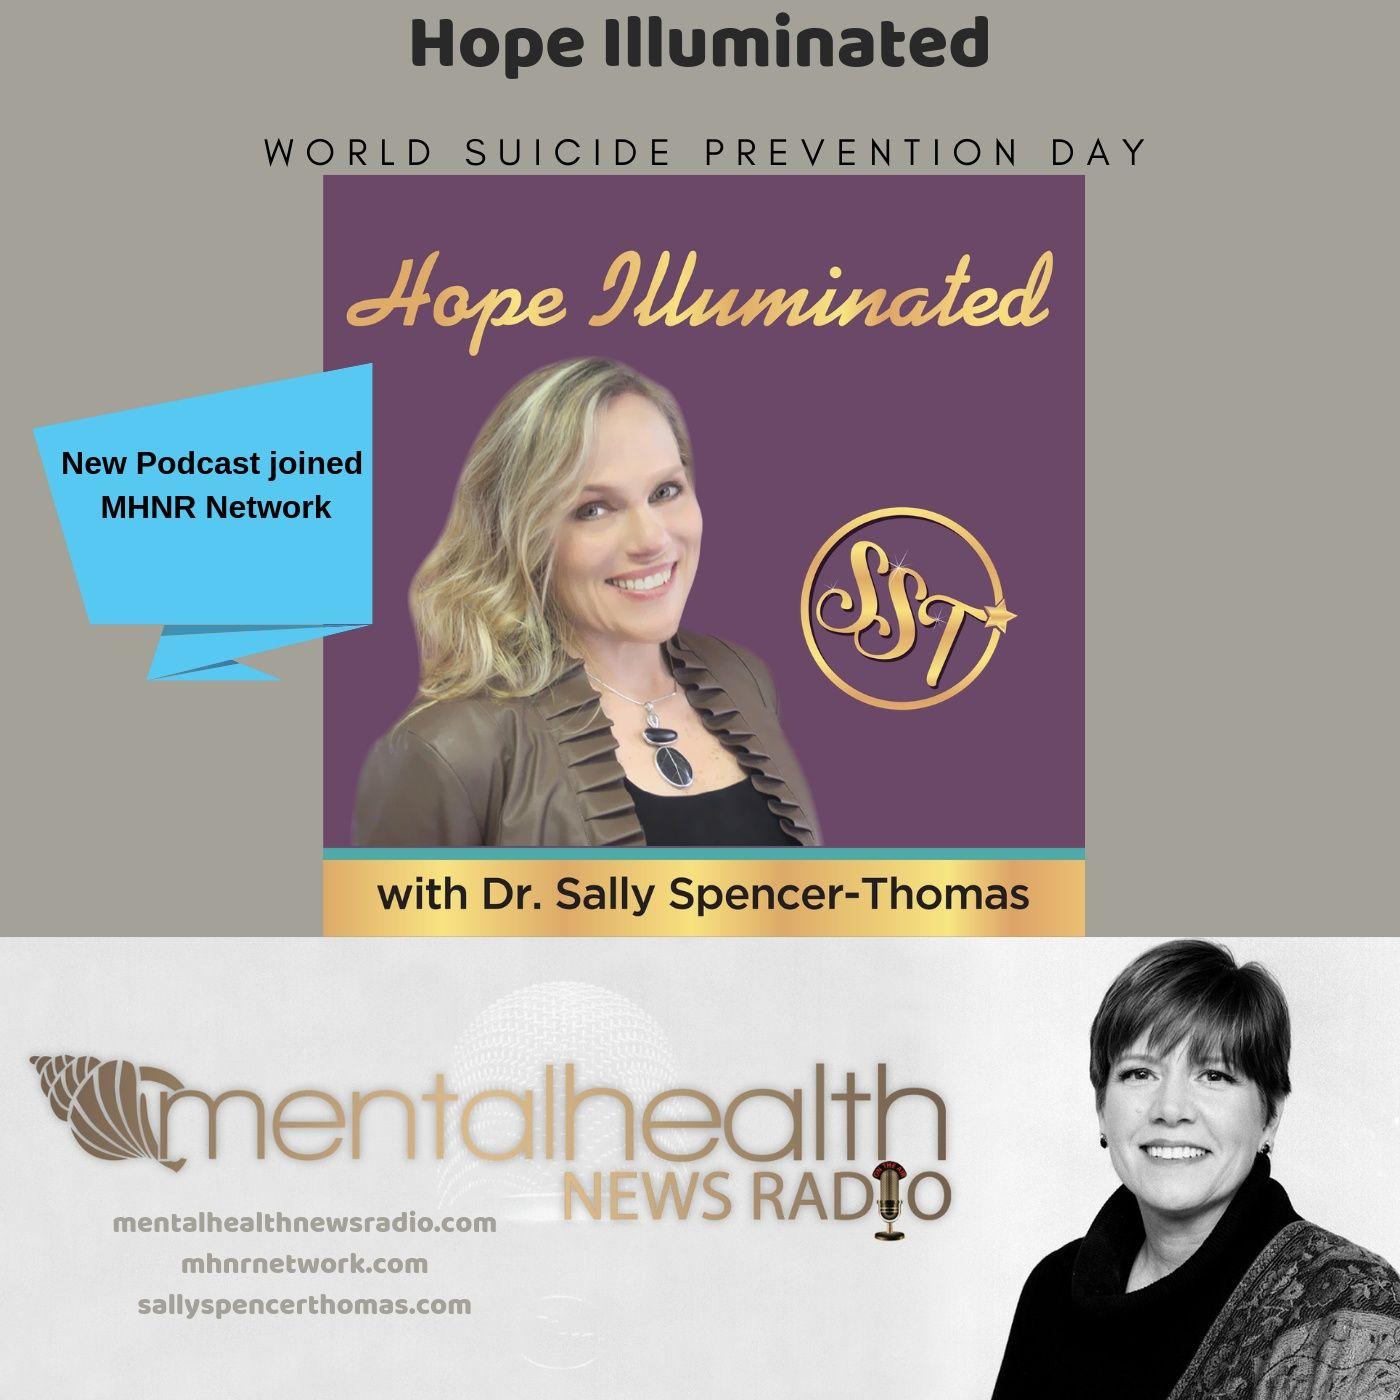 Mental Health News Radio - Hope Illuminated with Dr. Sally Spencer-Thomas